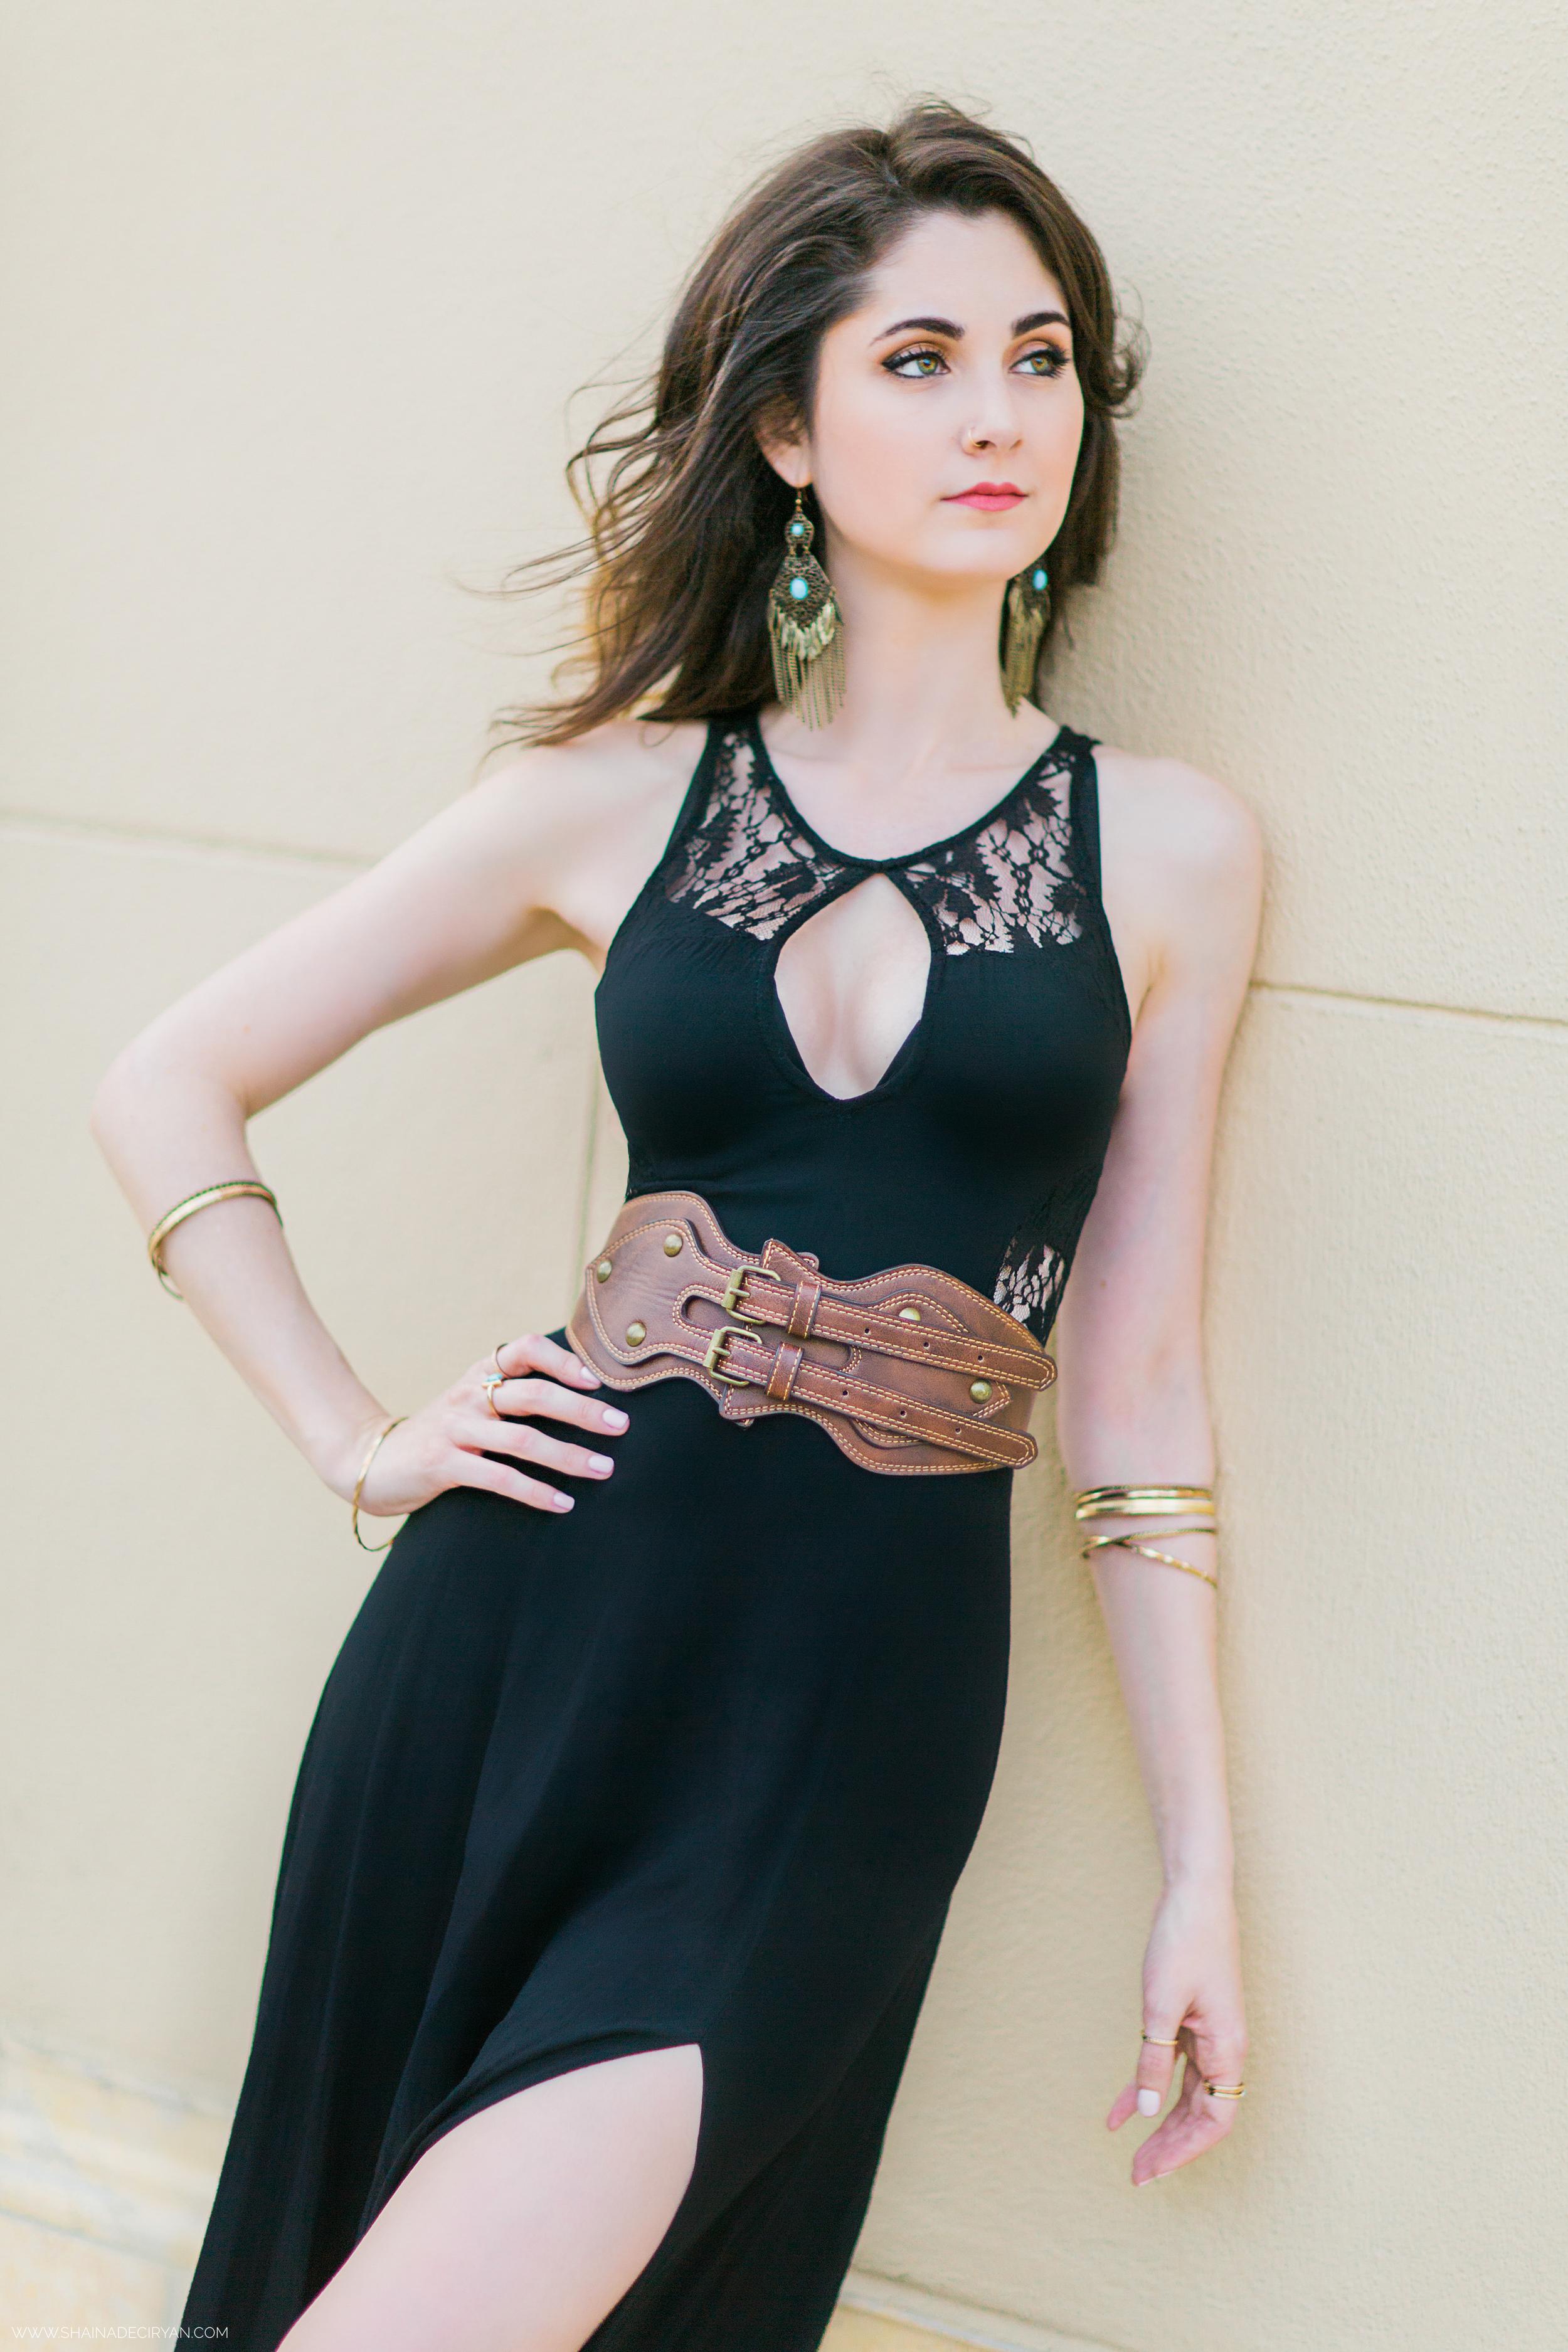 Orlando Winter Park Model - Alex Knape - boho style beauty 20.jpg